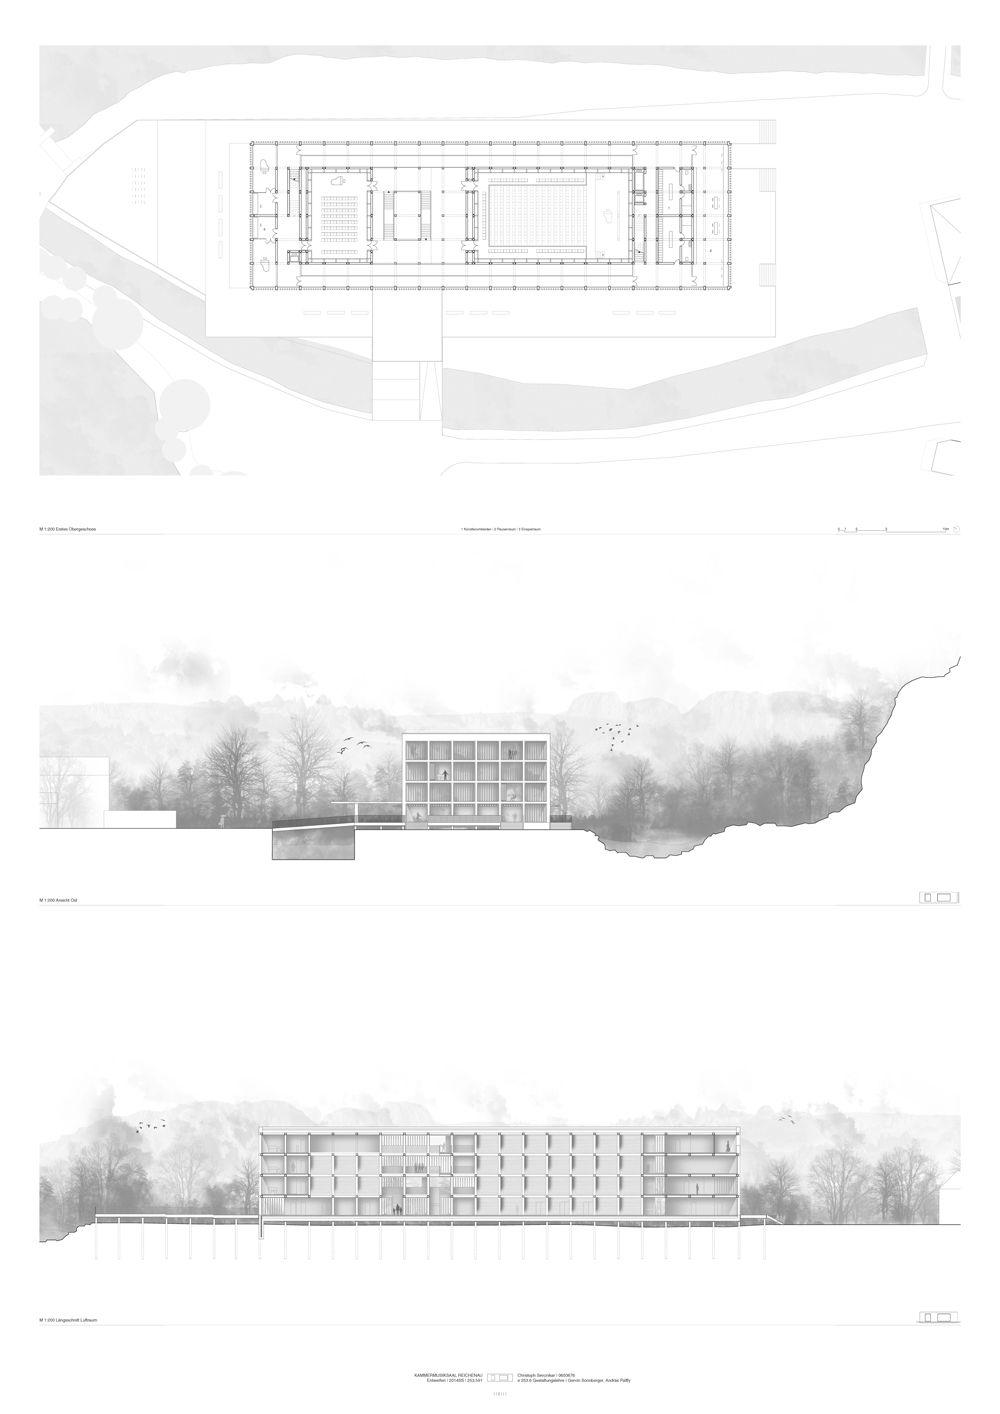 Elevation Plan Presentation : Architecture presentation section elevation plan layout